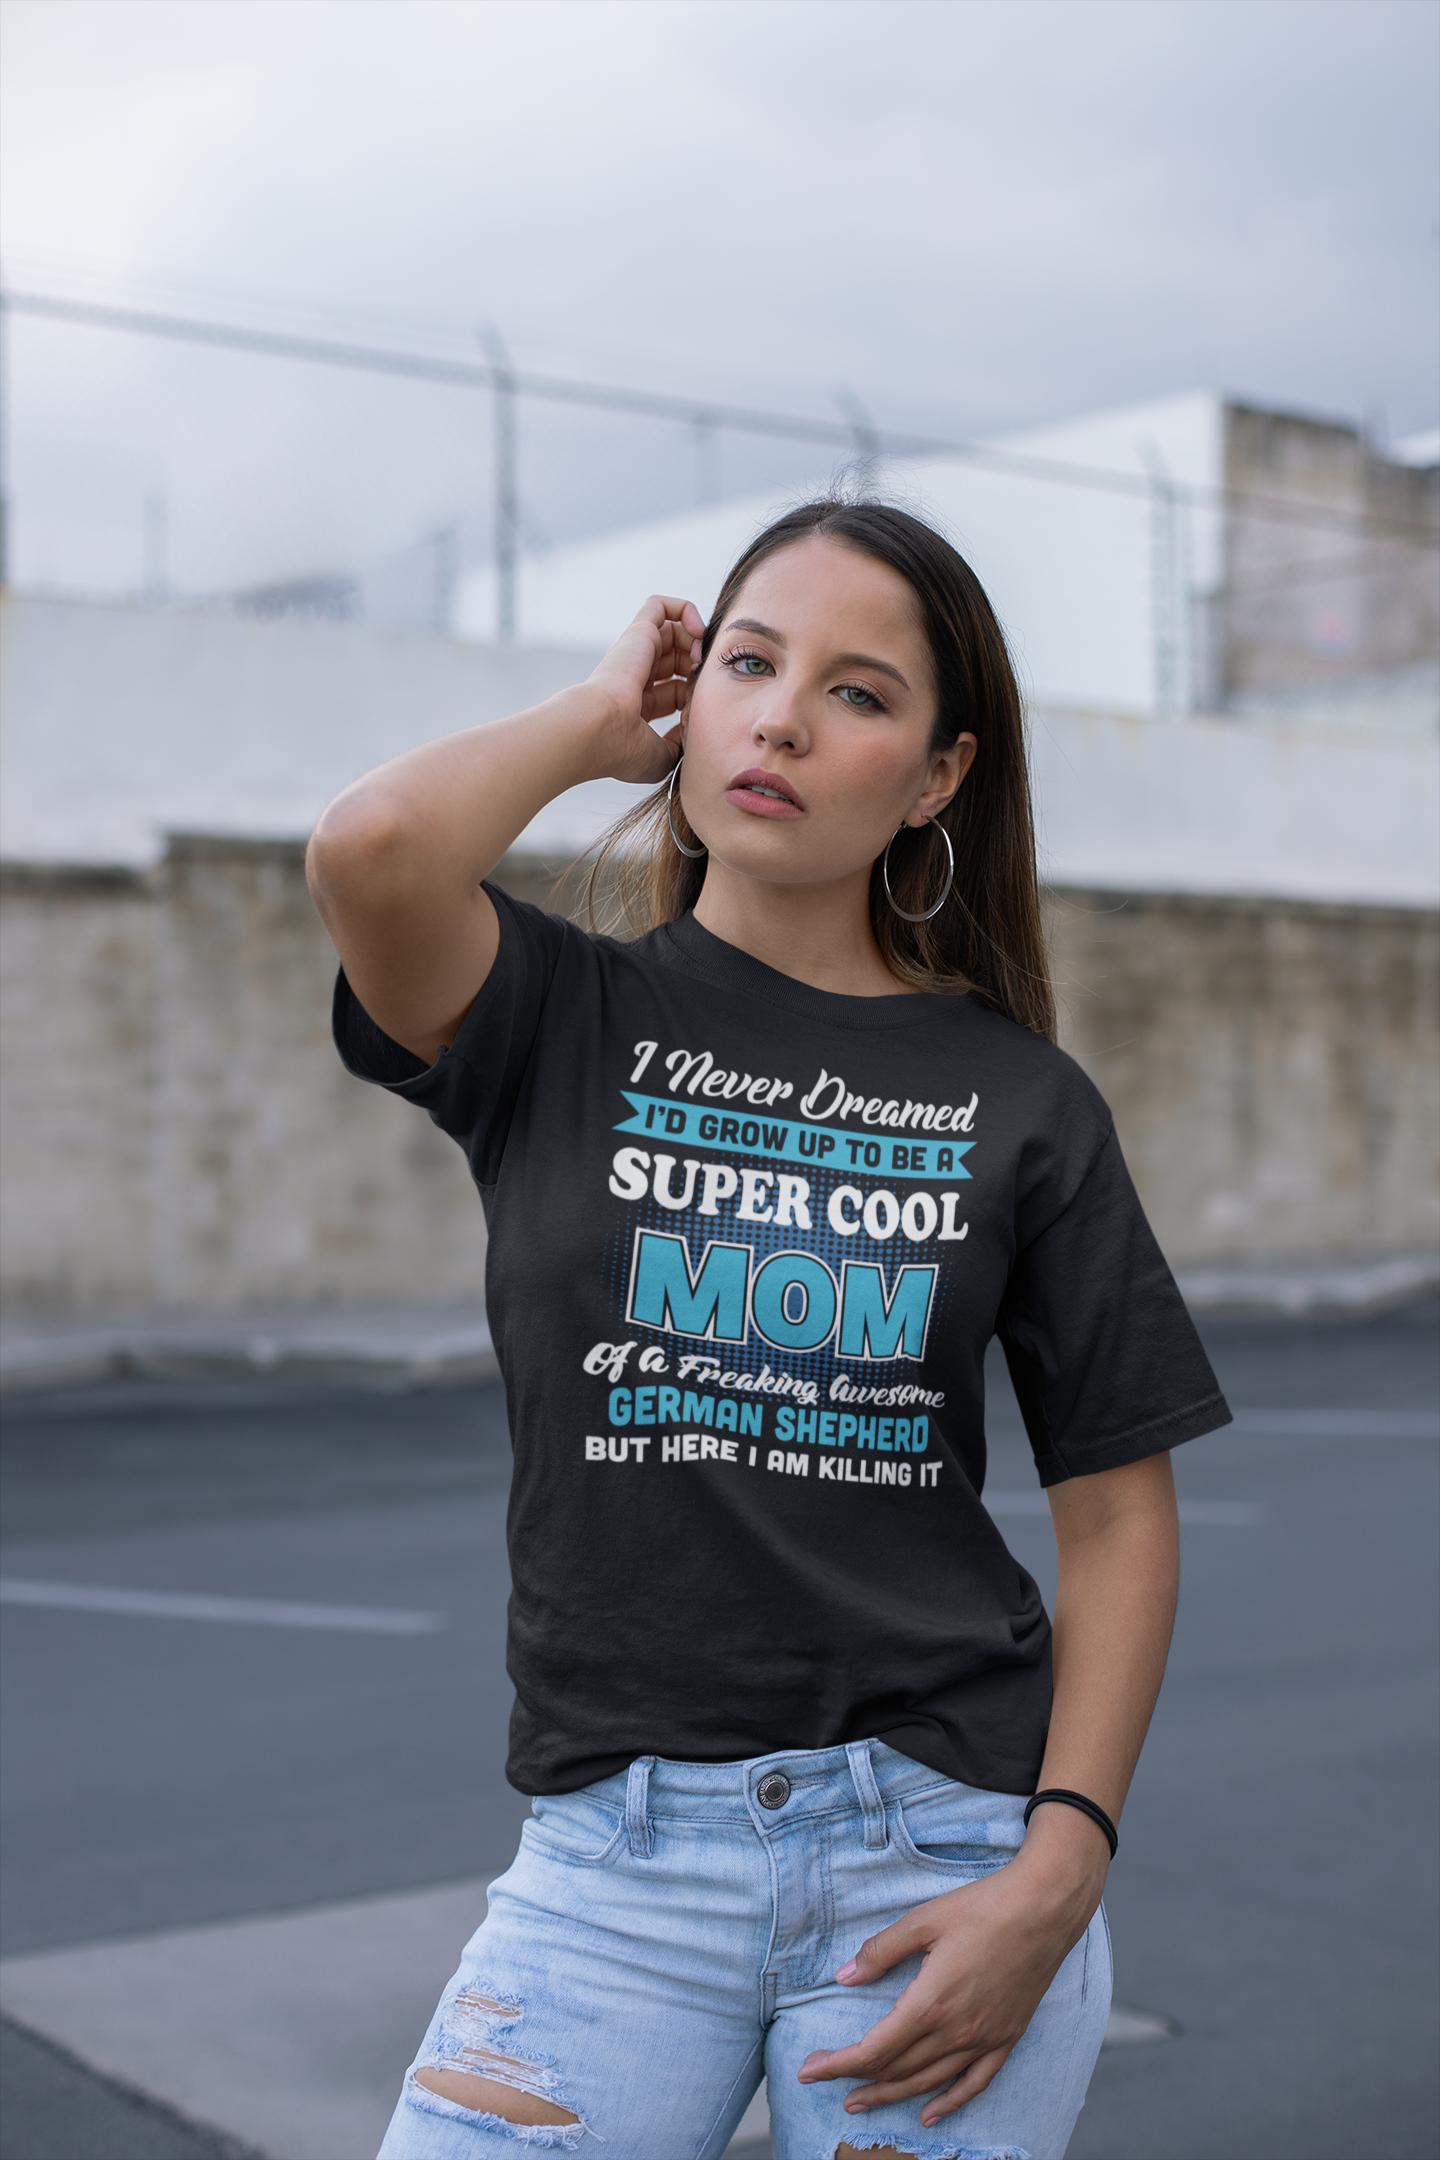 Super Cool German Shepherd Mom - T-Shirts   Women, Nursing